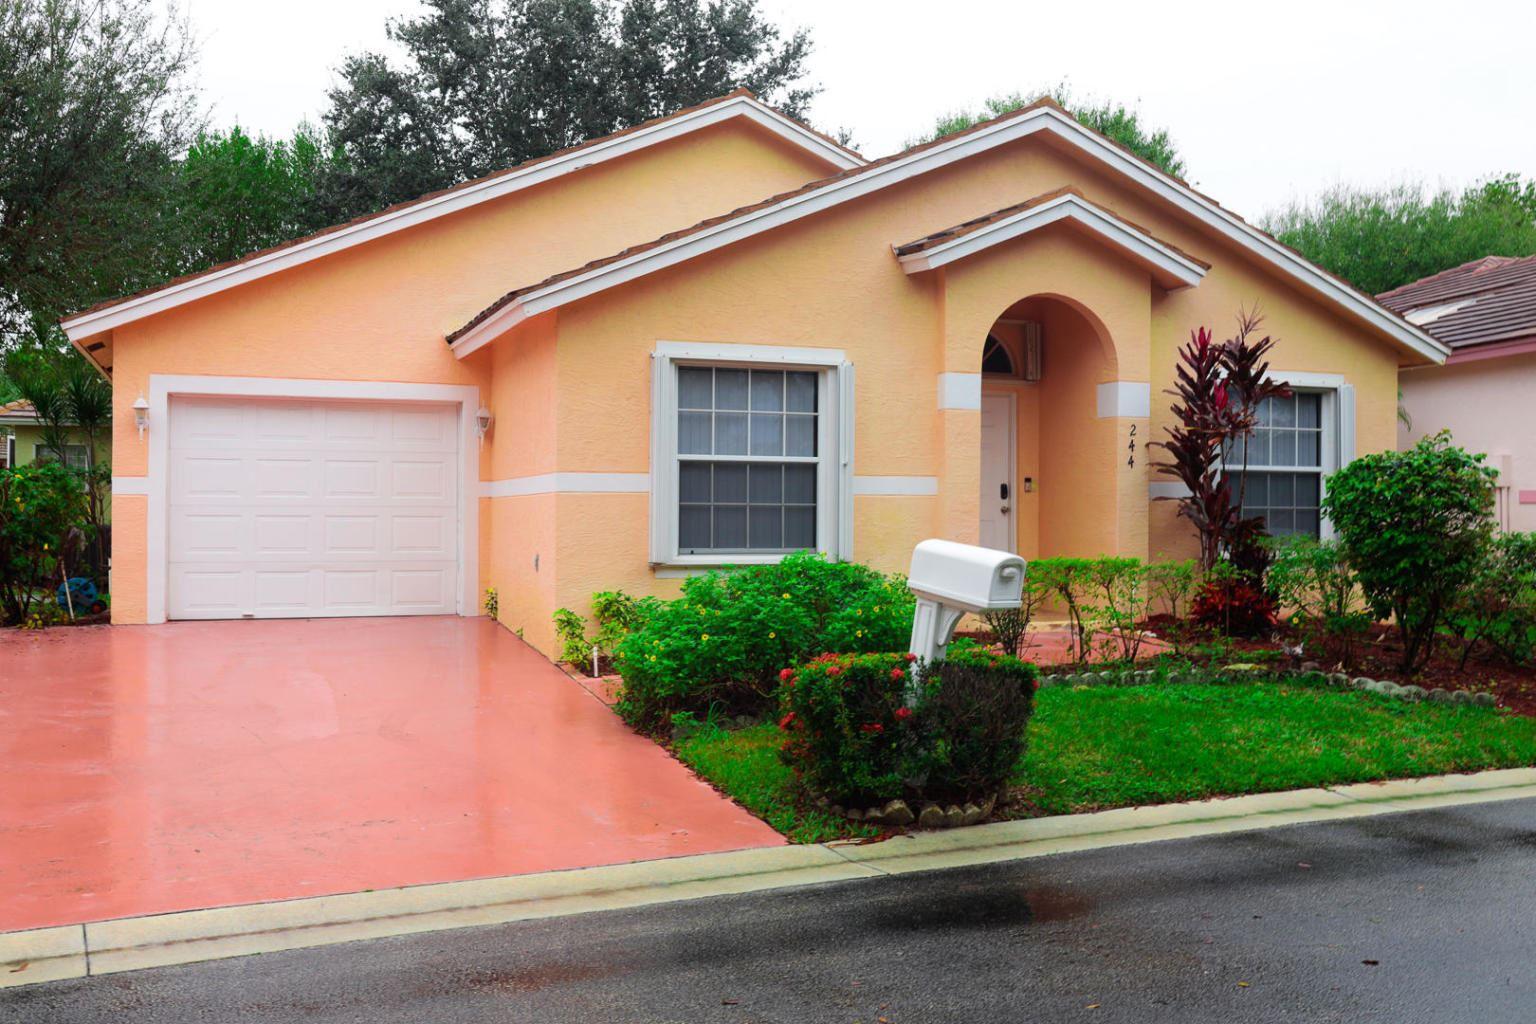 244 Caribe Court, Greenacres, FL 33413 - #: RX-10635339